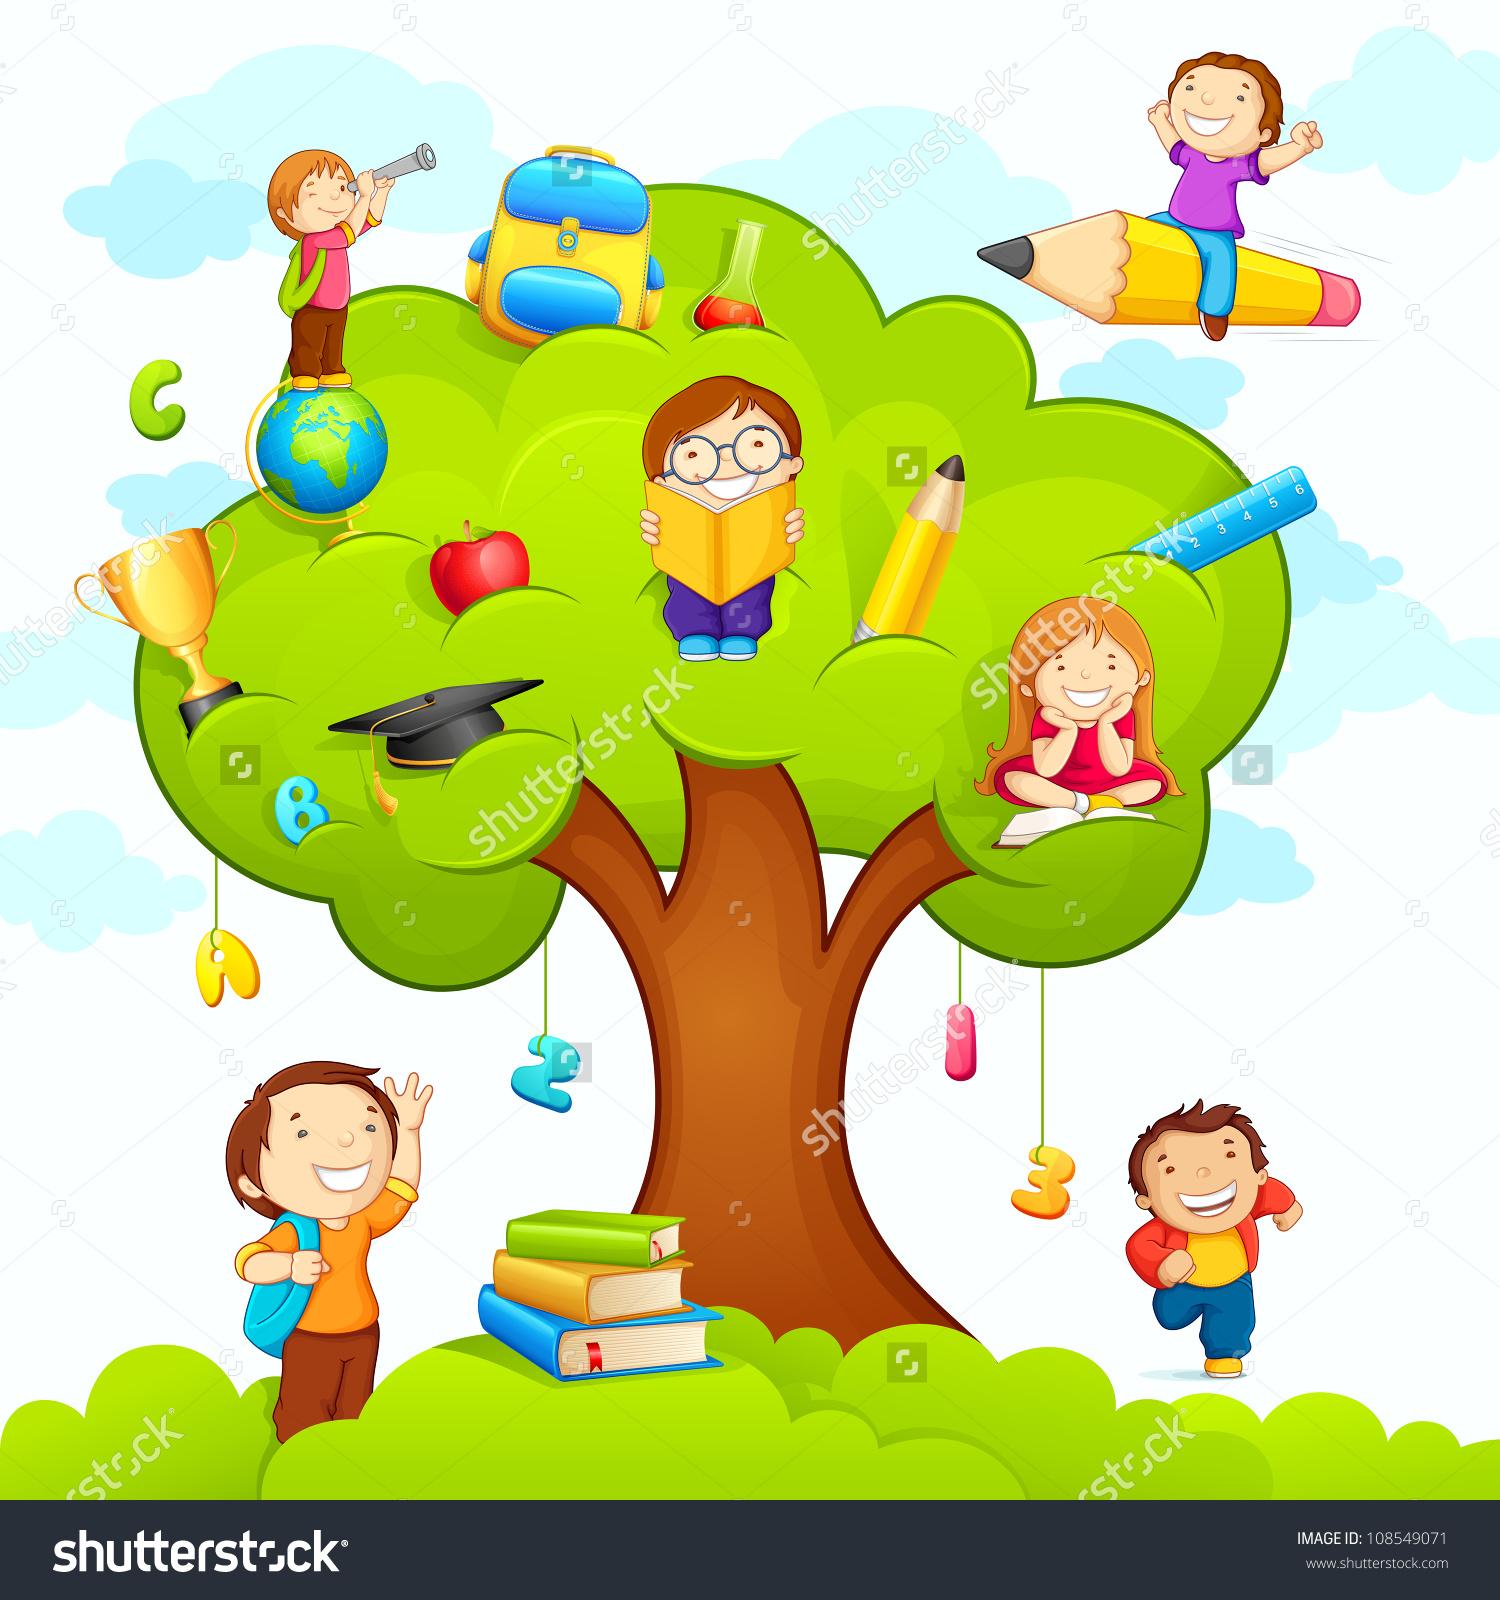 different color children education clipart - Clipground